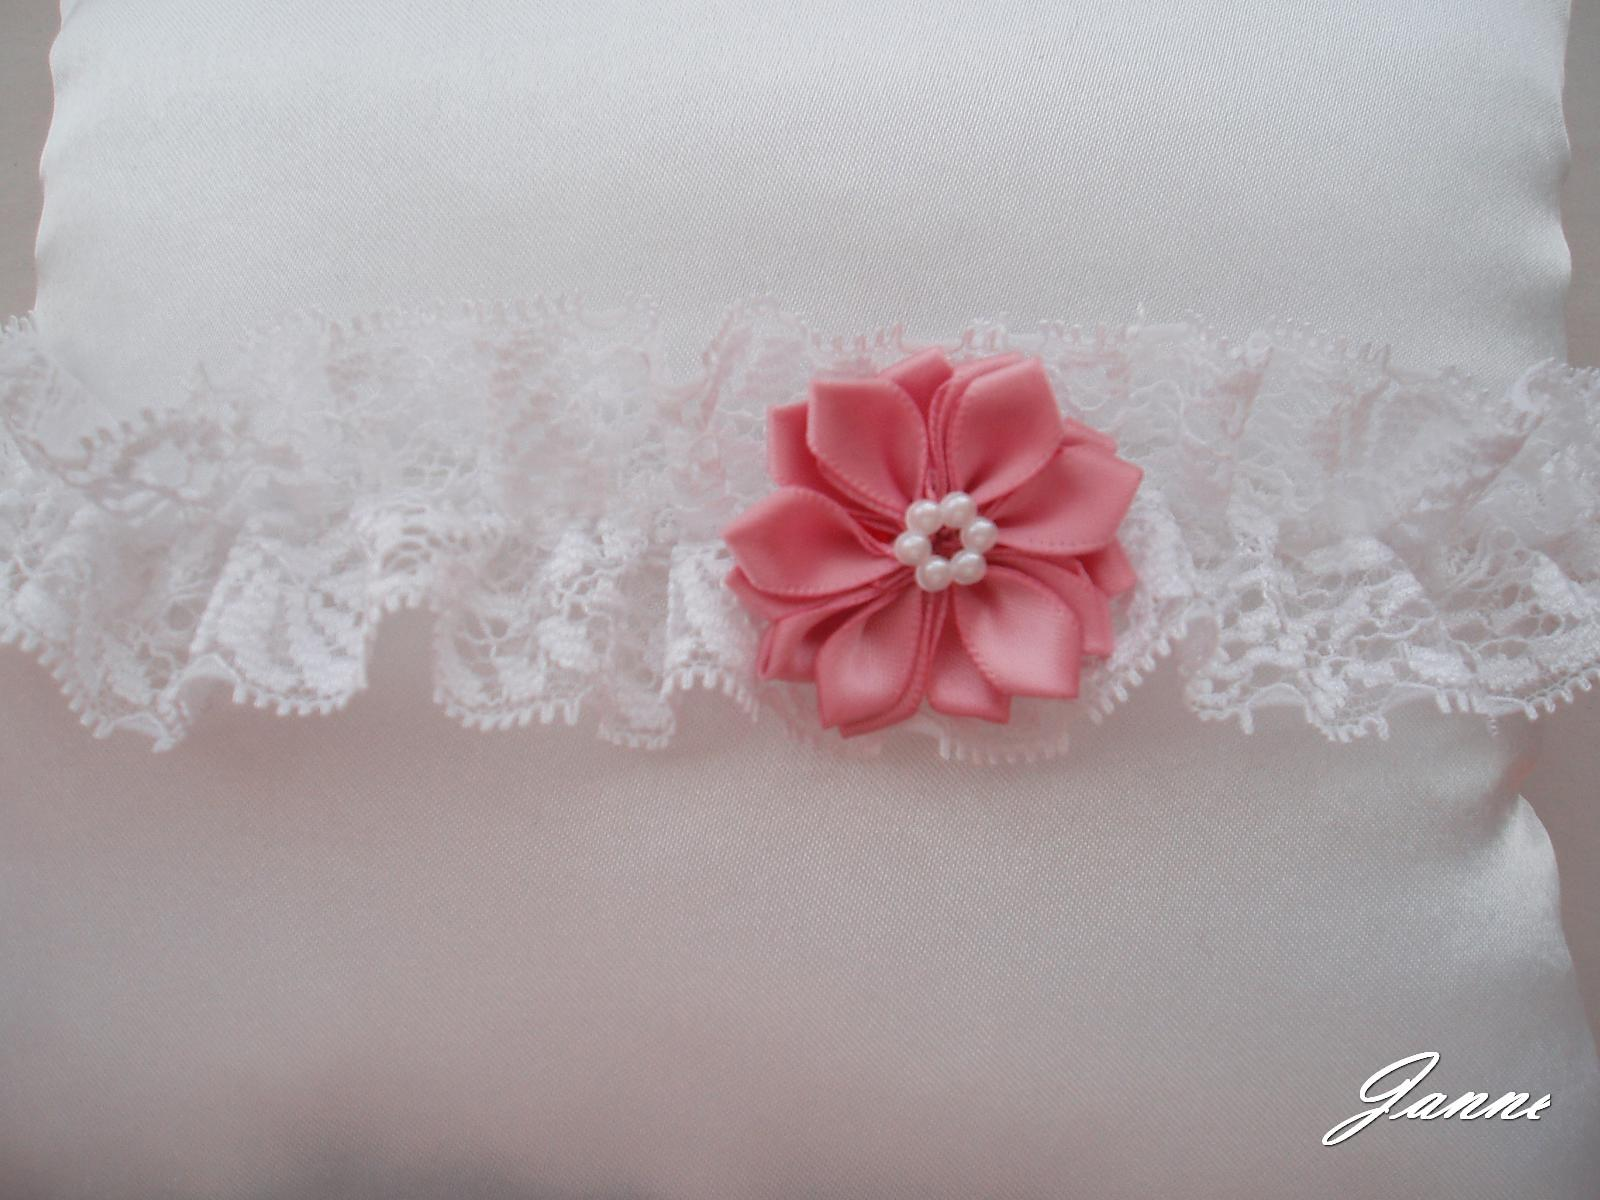 krajkový podvazek s kytičkou-starorůžová - Obrázek č. 1